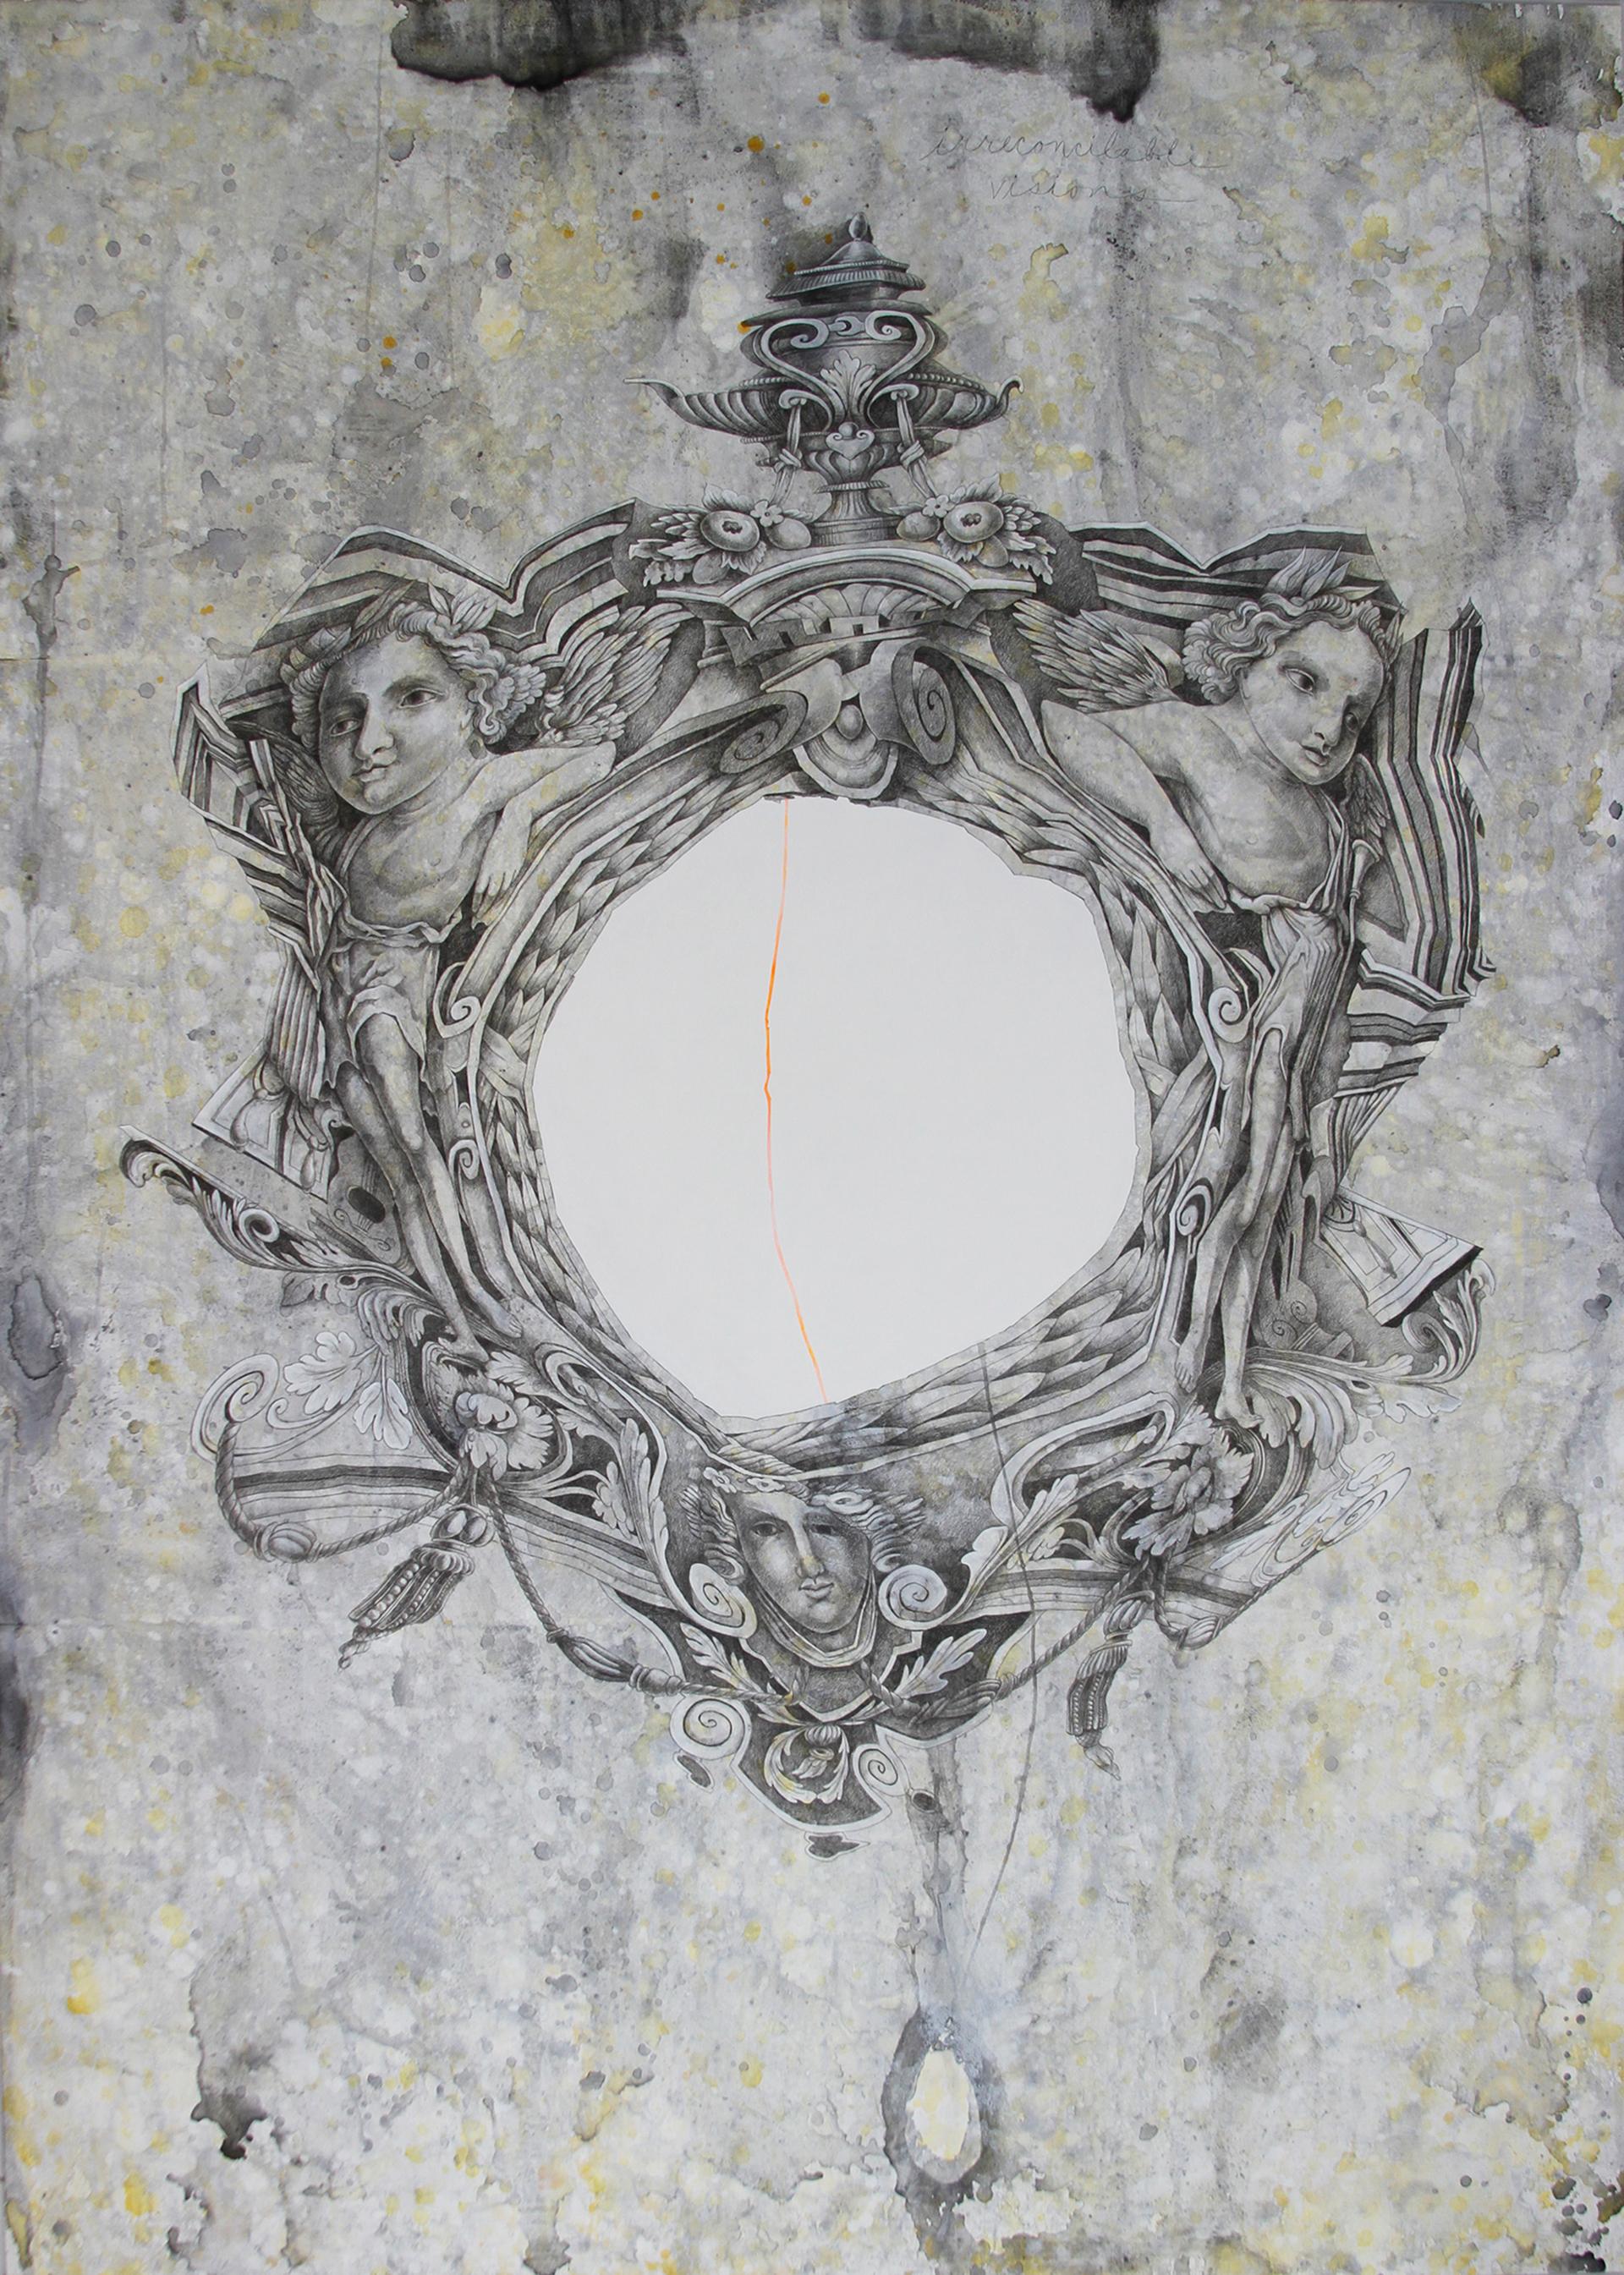 Blind Spots/Cruel Poetics: Les Pantalones Rouge by Patricia Bellan-Gillen